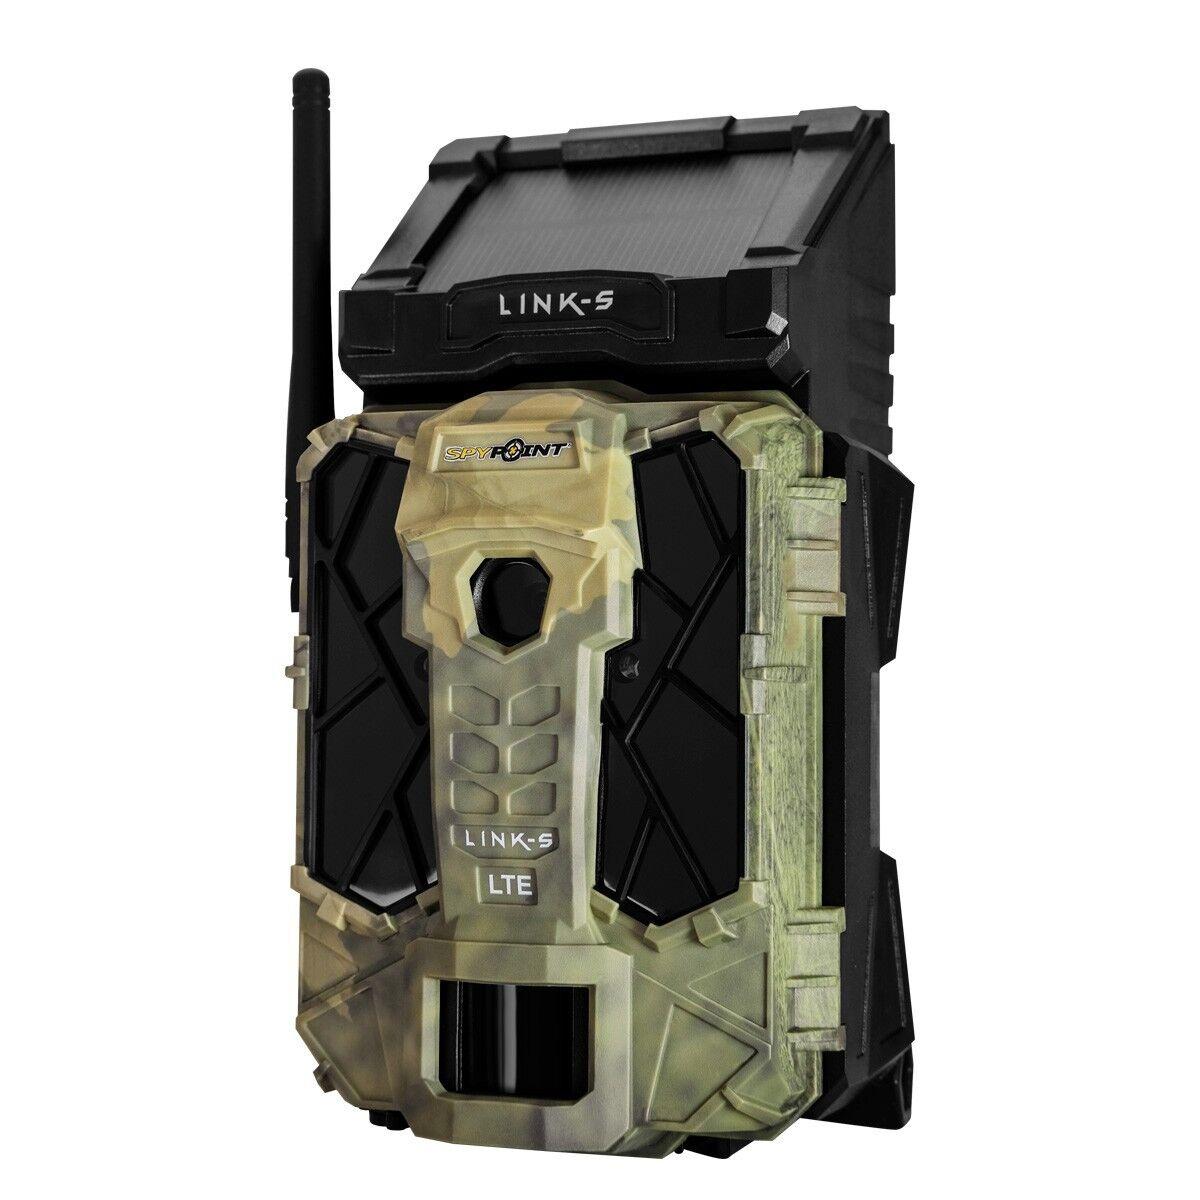 Spypoint Mobile AT&T LTE Celular 12MP Juego Solar de vídeo HD Cámara Trail-link-S